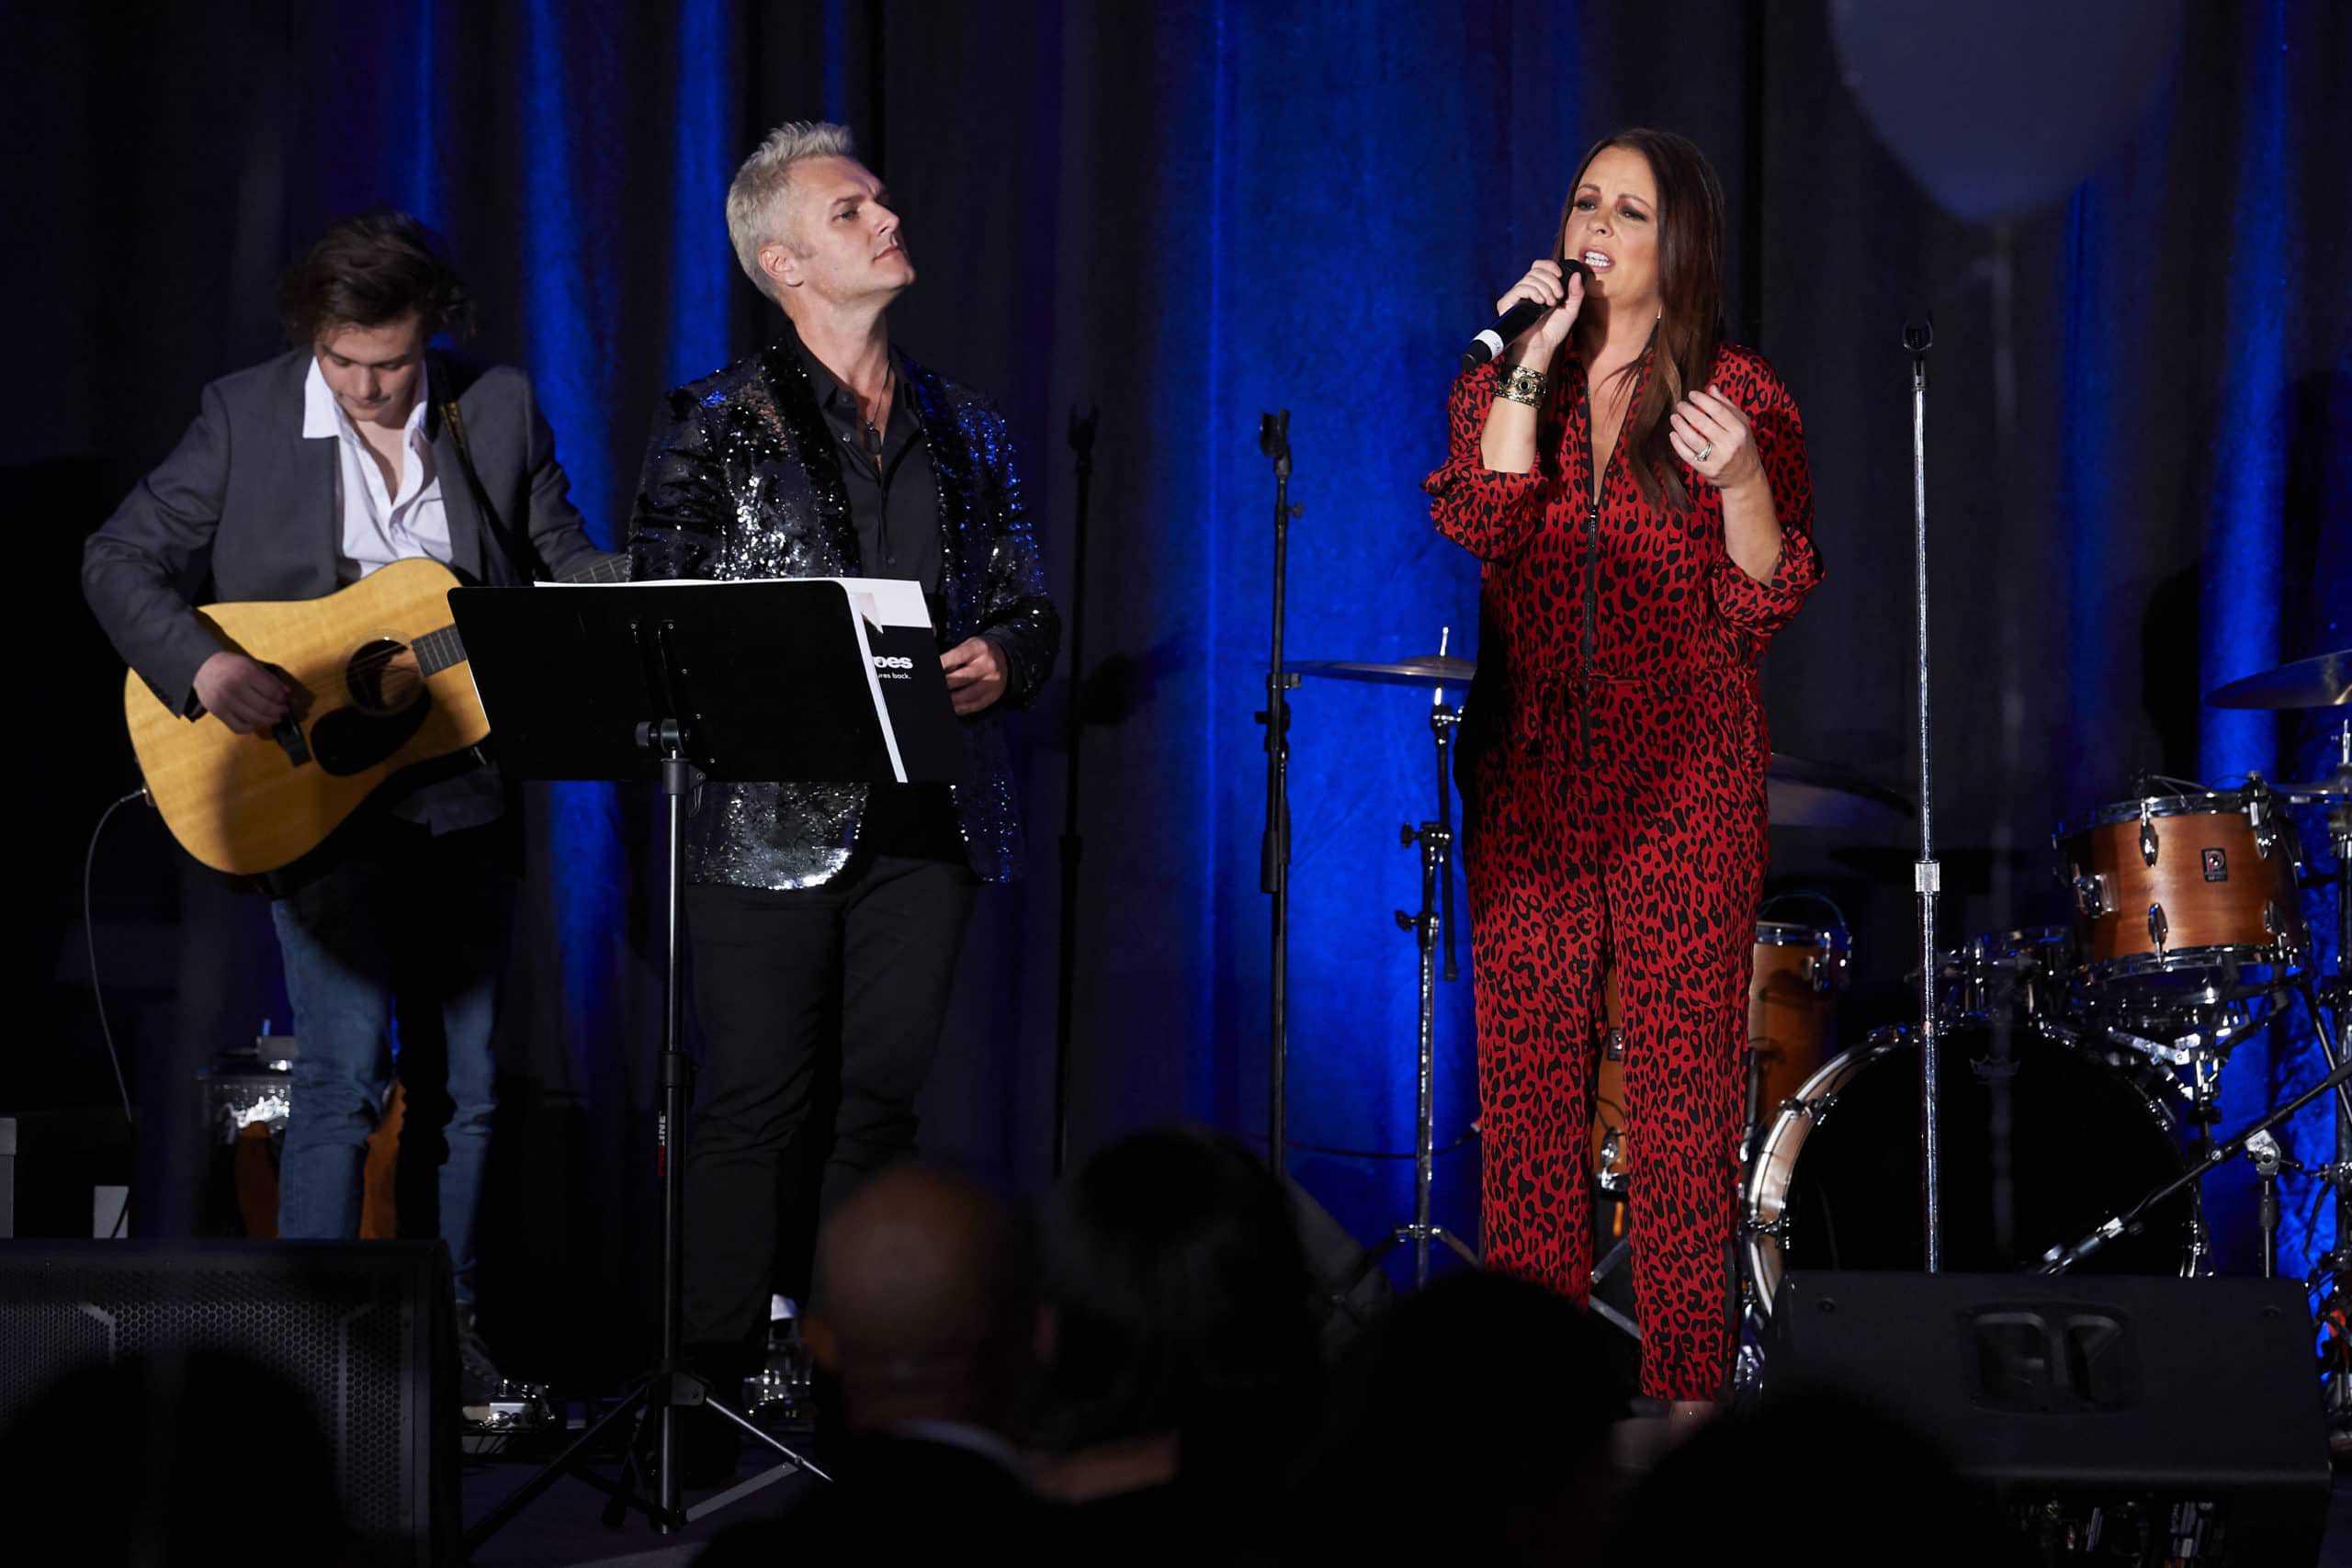 Shane Stevens performs with Sara Evans